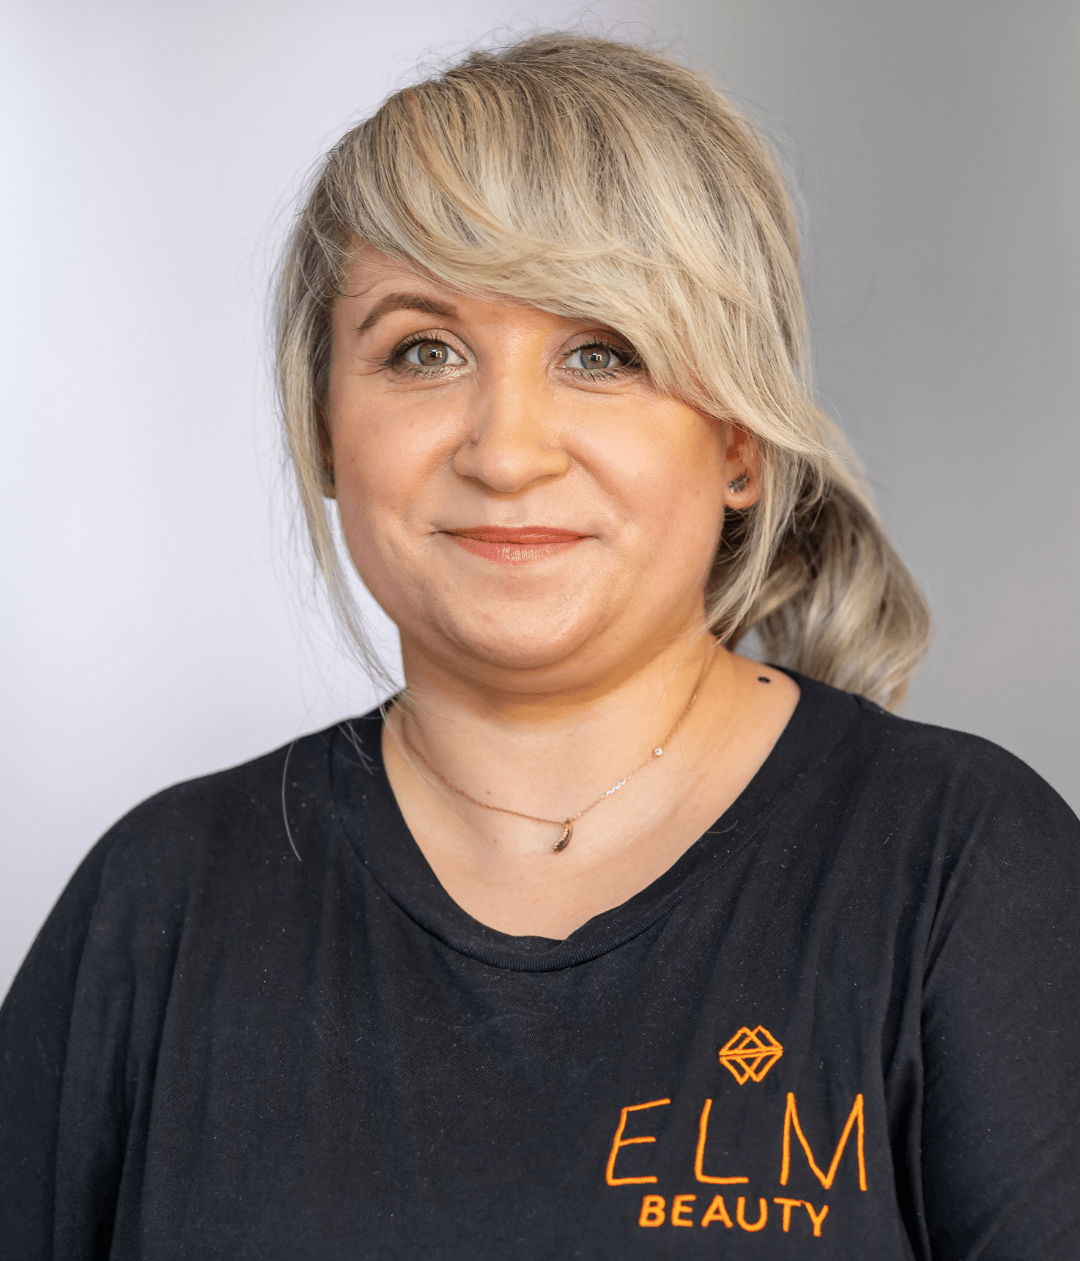 About ELM Beauty